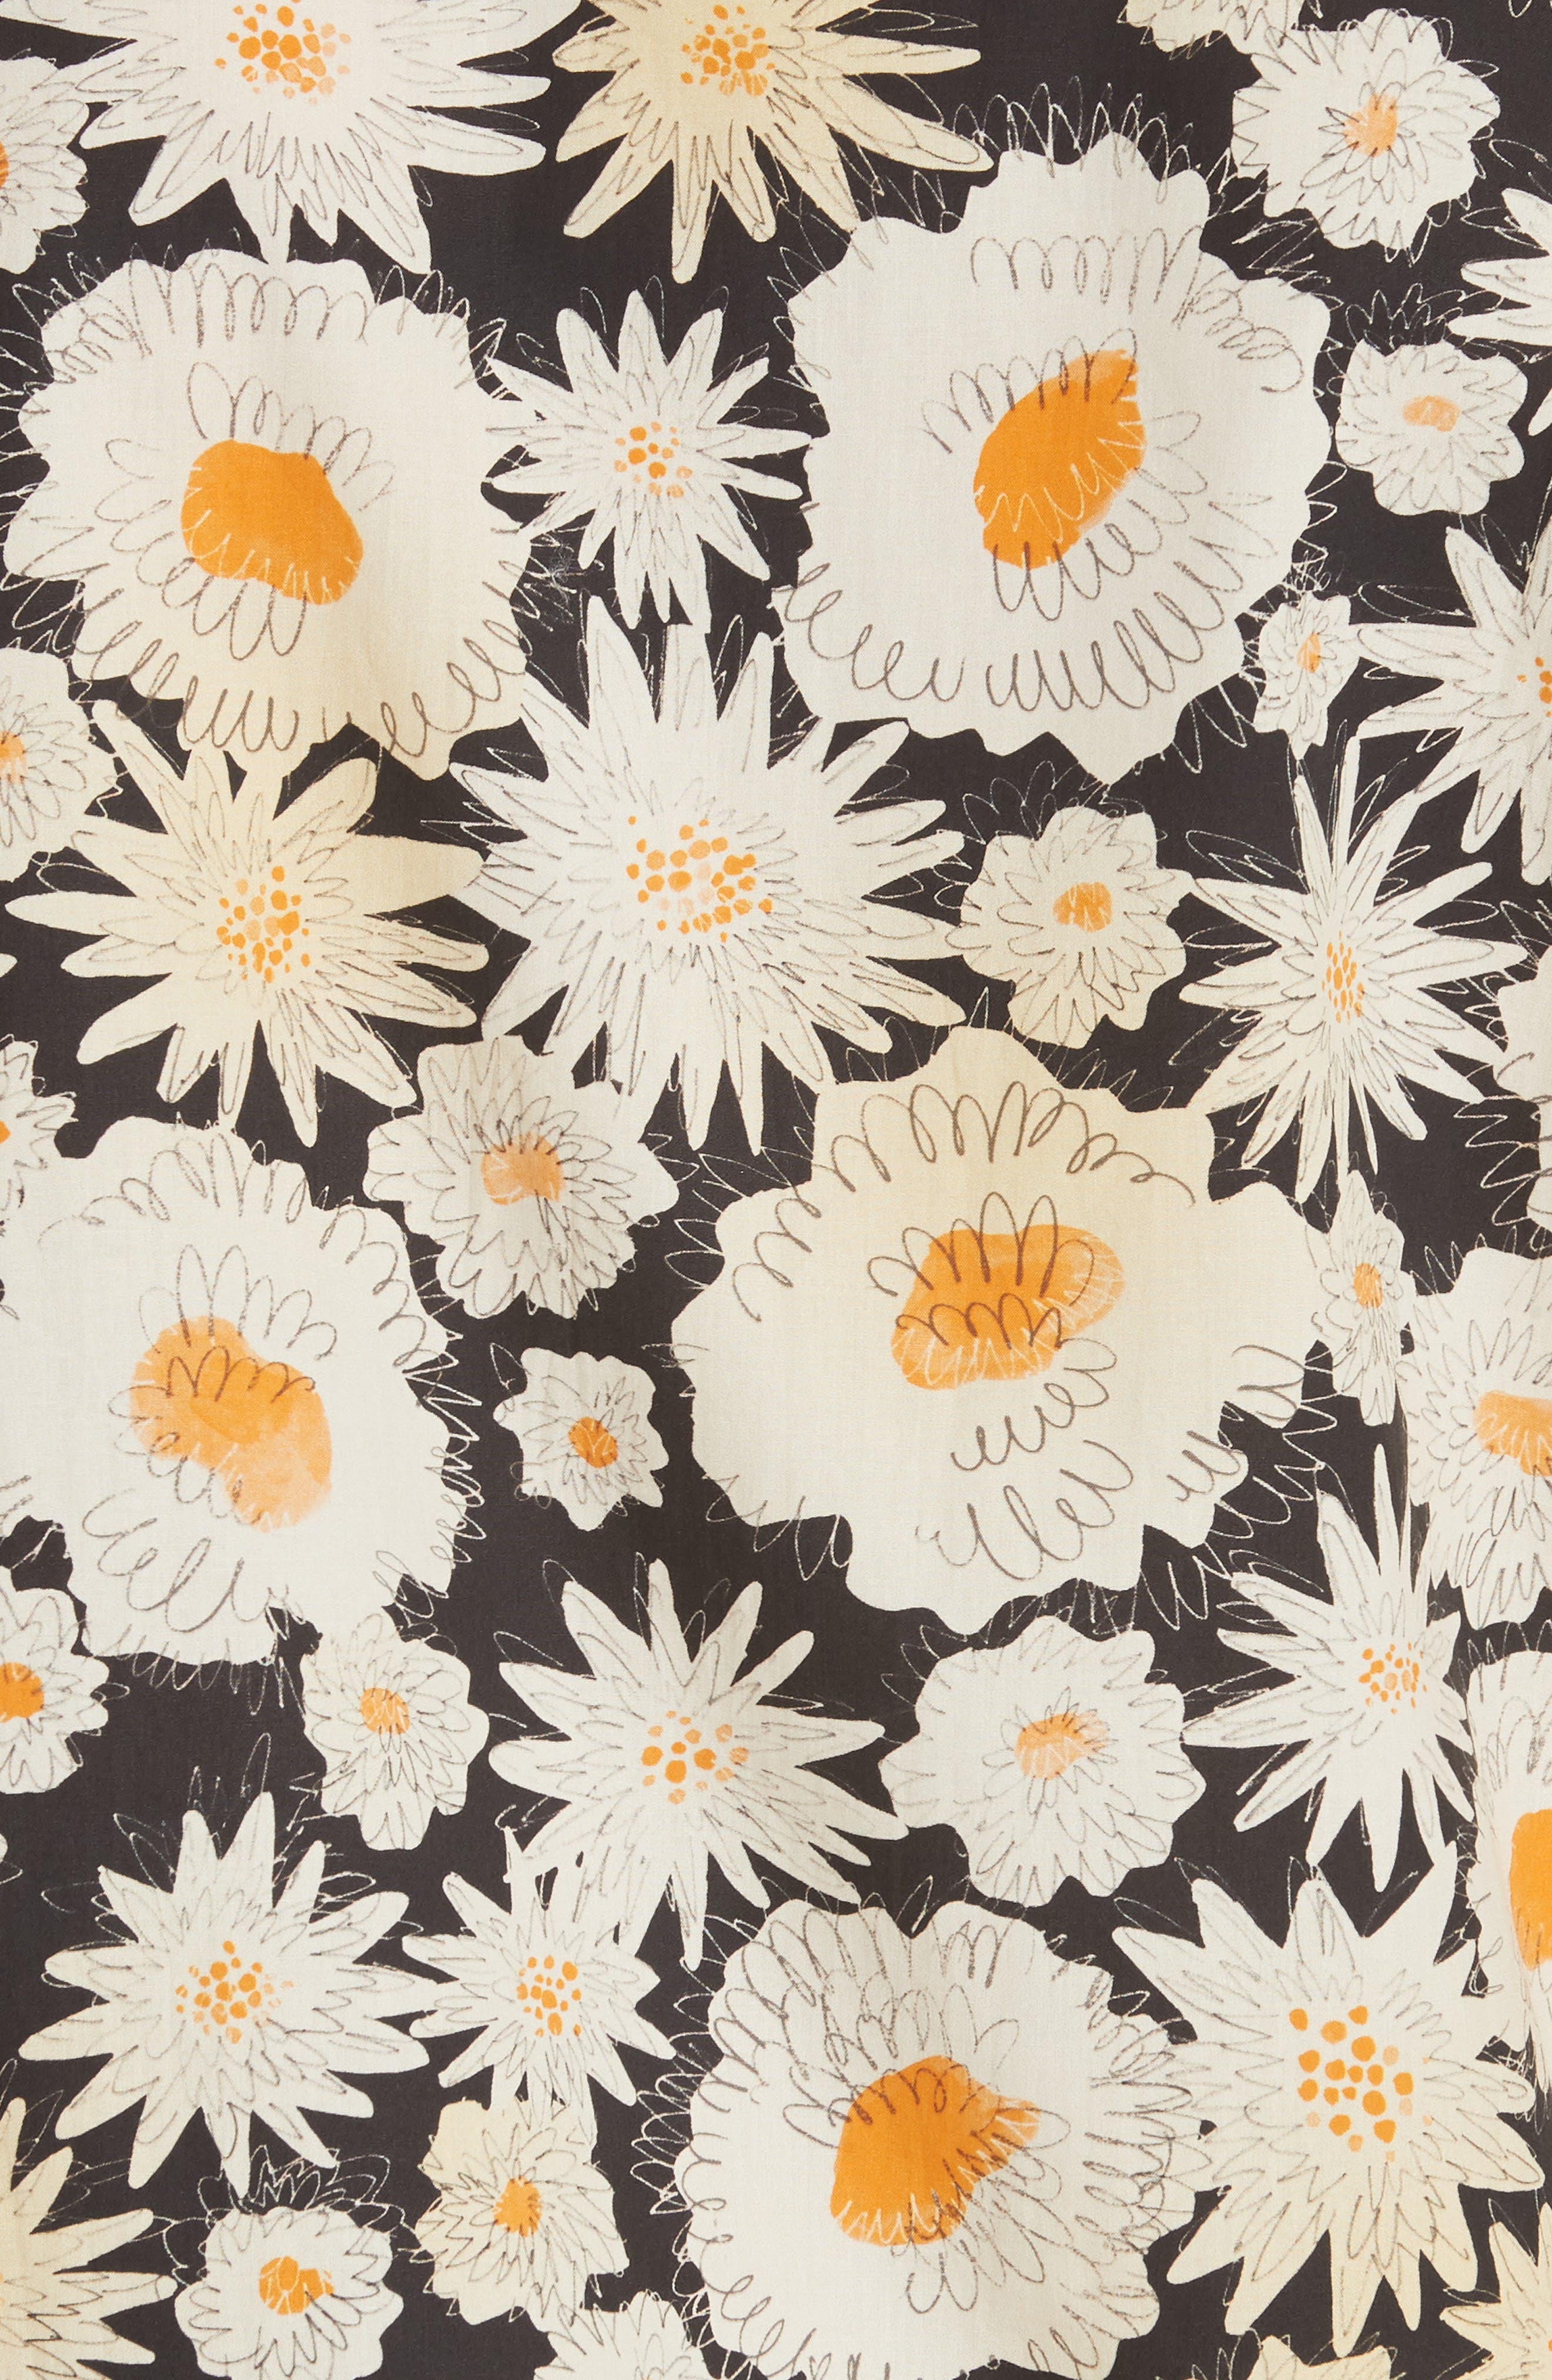 Jude Floral Print Shirt,                             Alternate thumbnail 5, color,                             001